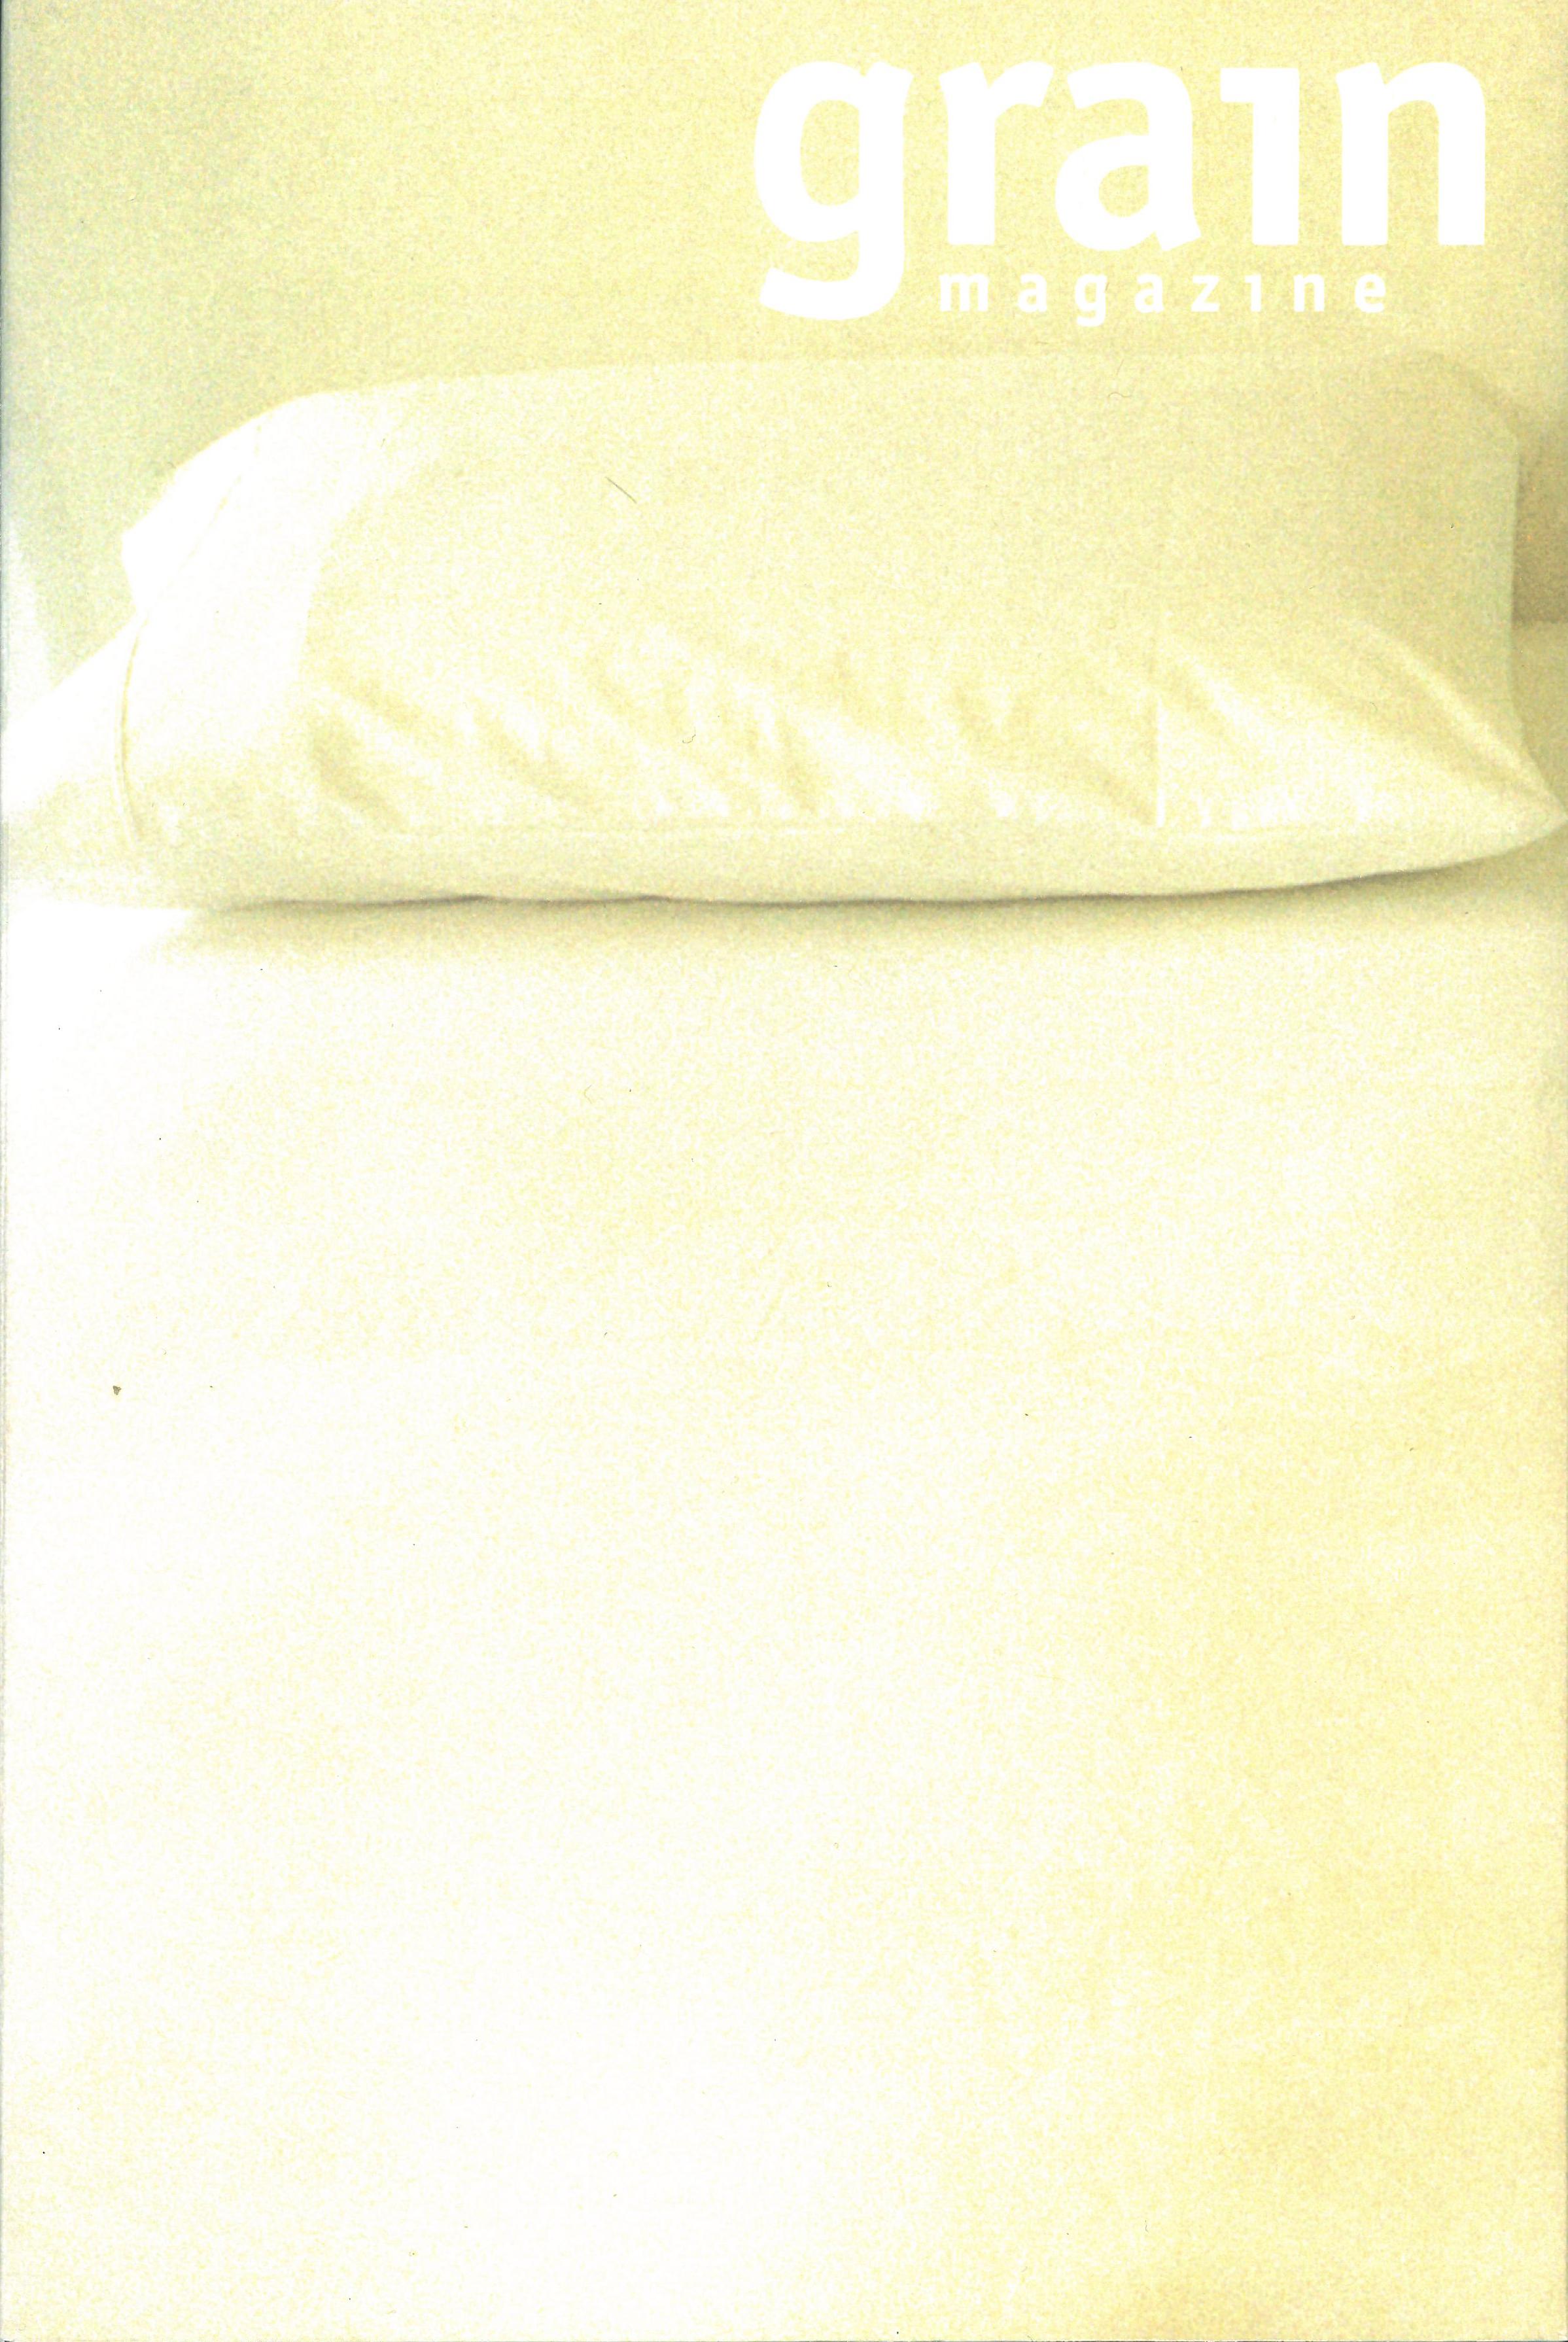 33.3 Winter 2006, Don't Fall Asleep (sleeve)